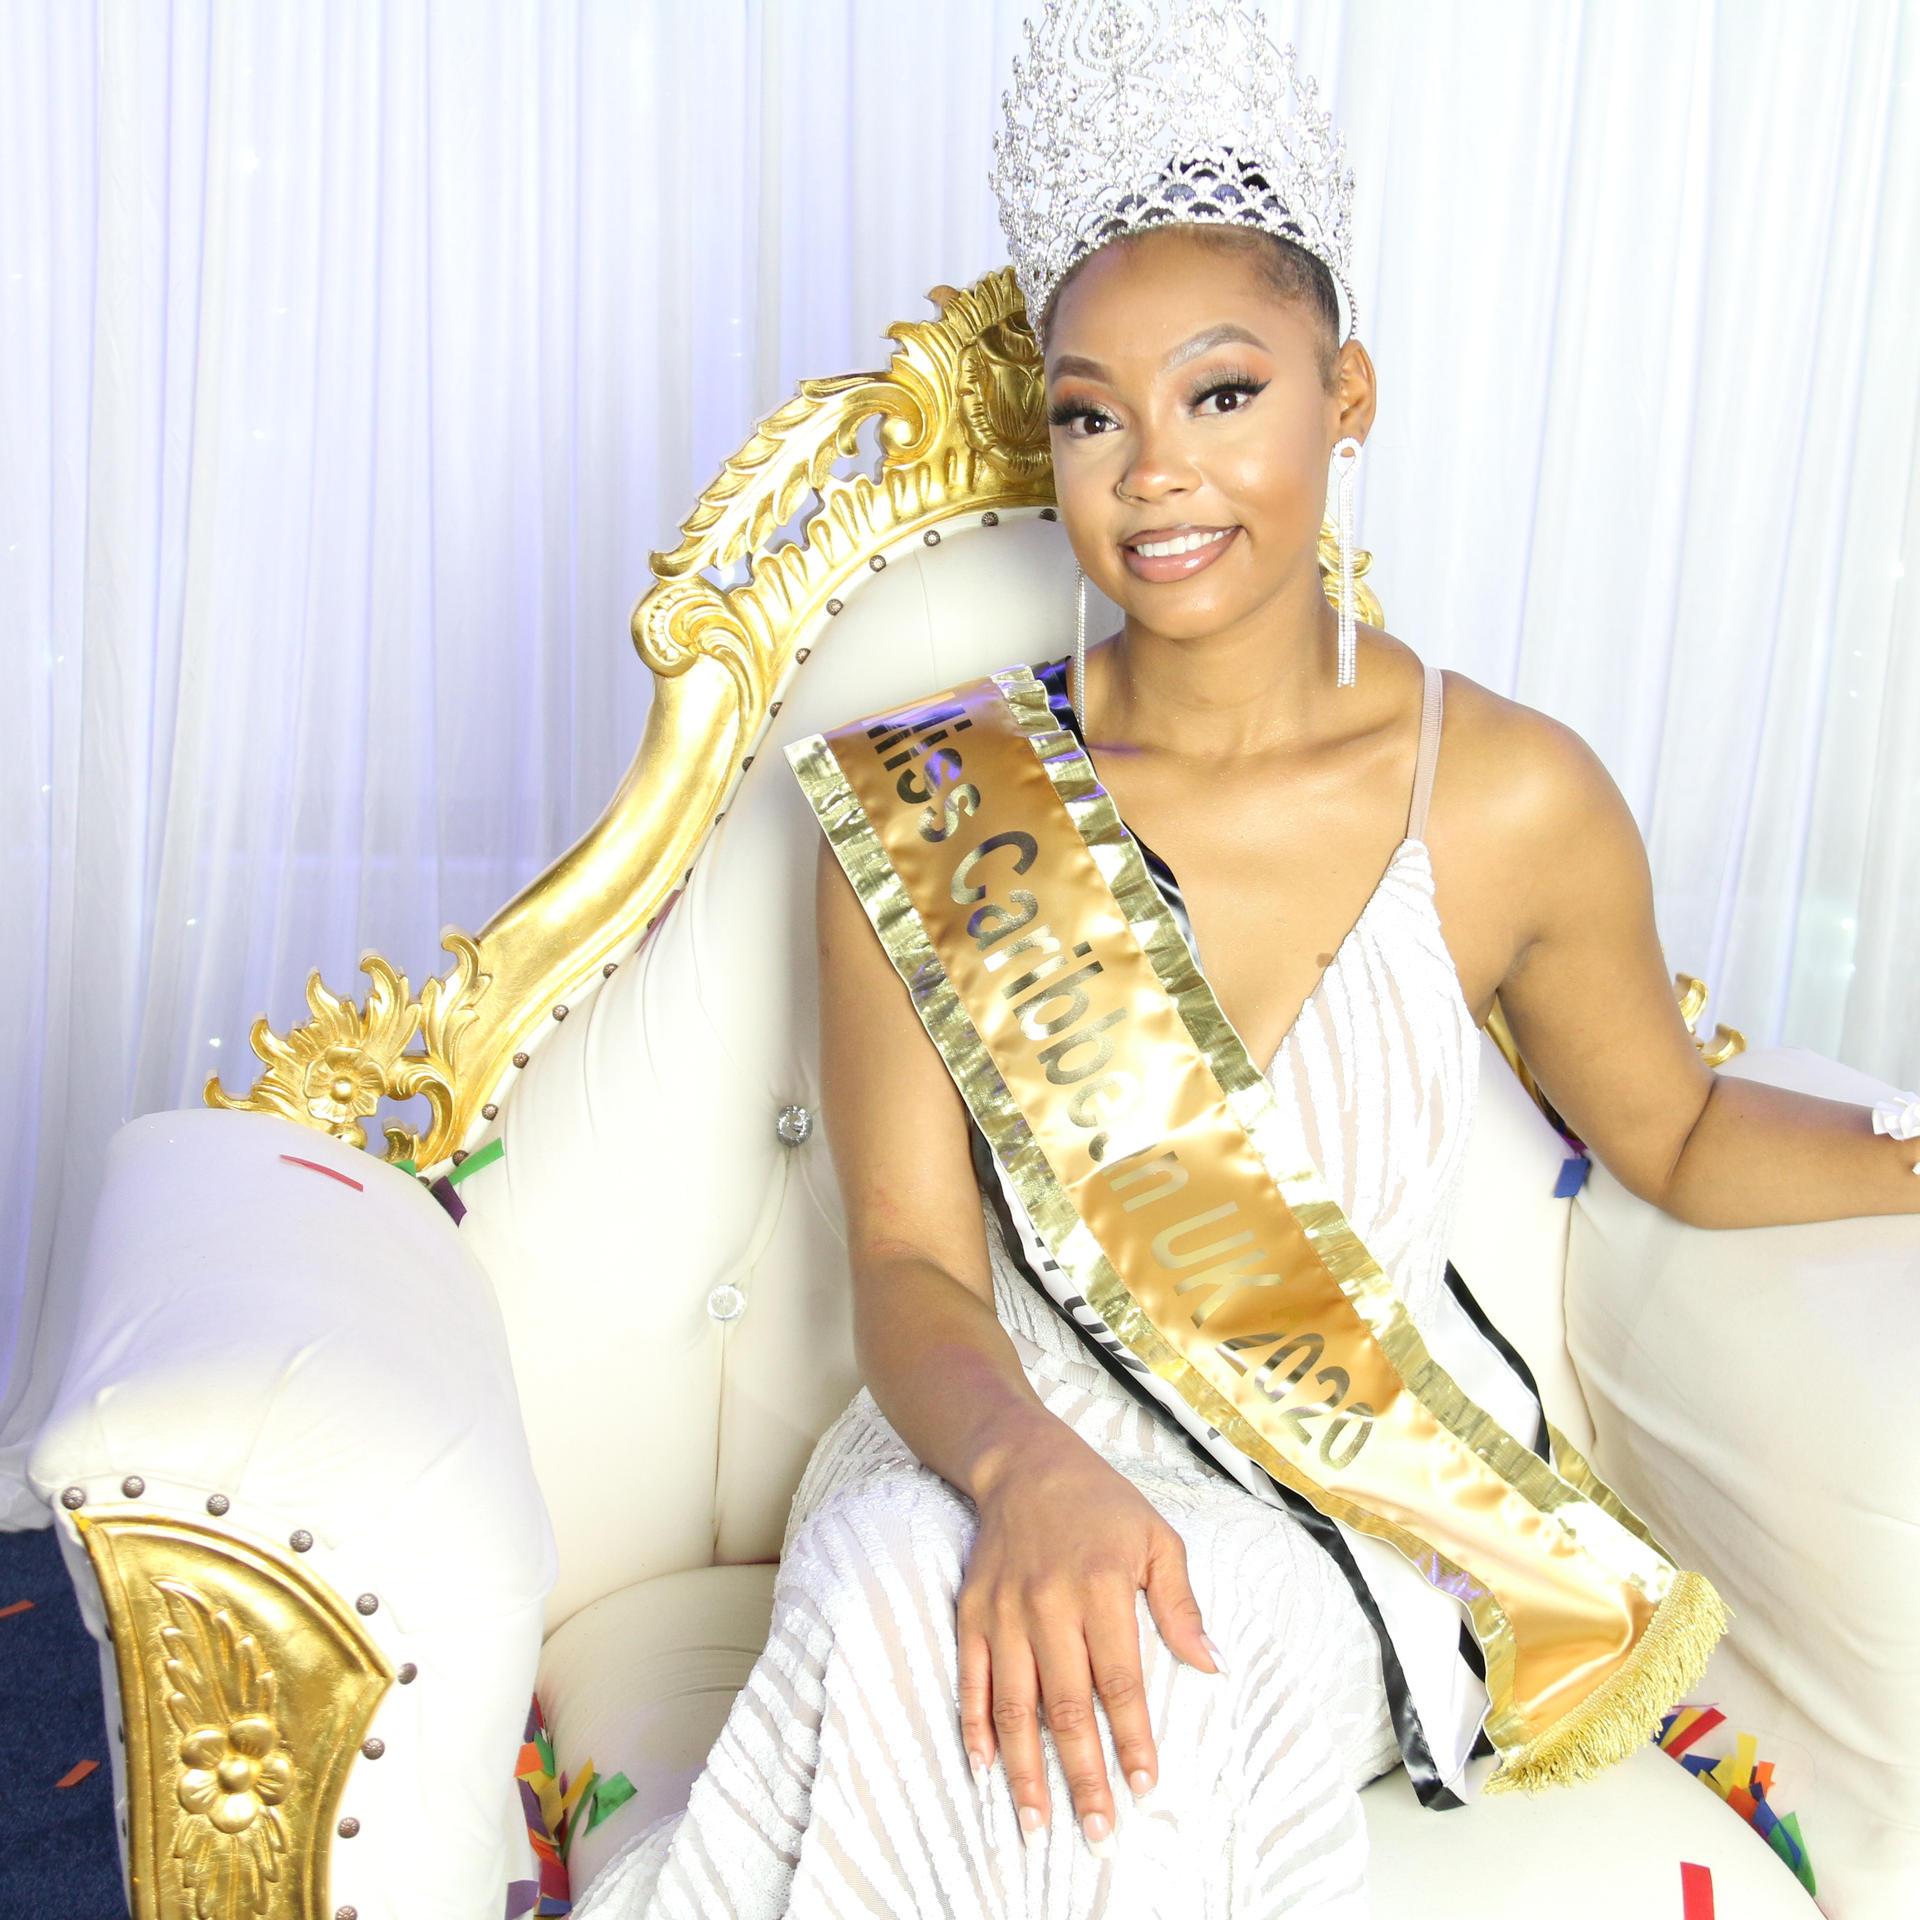 Miss Caribbean UK 2020 Queen - Farrah Grant